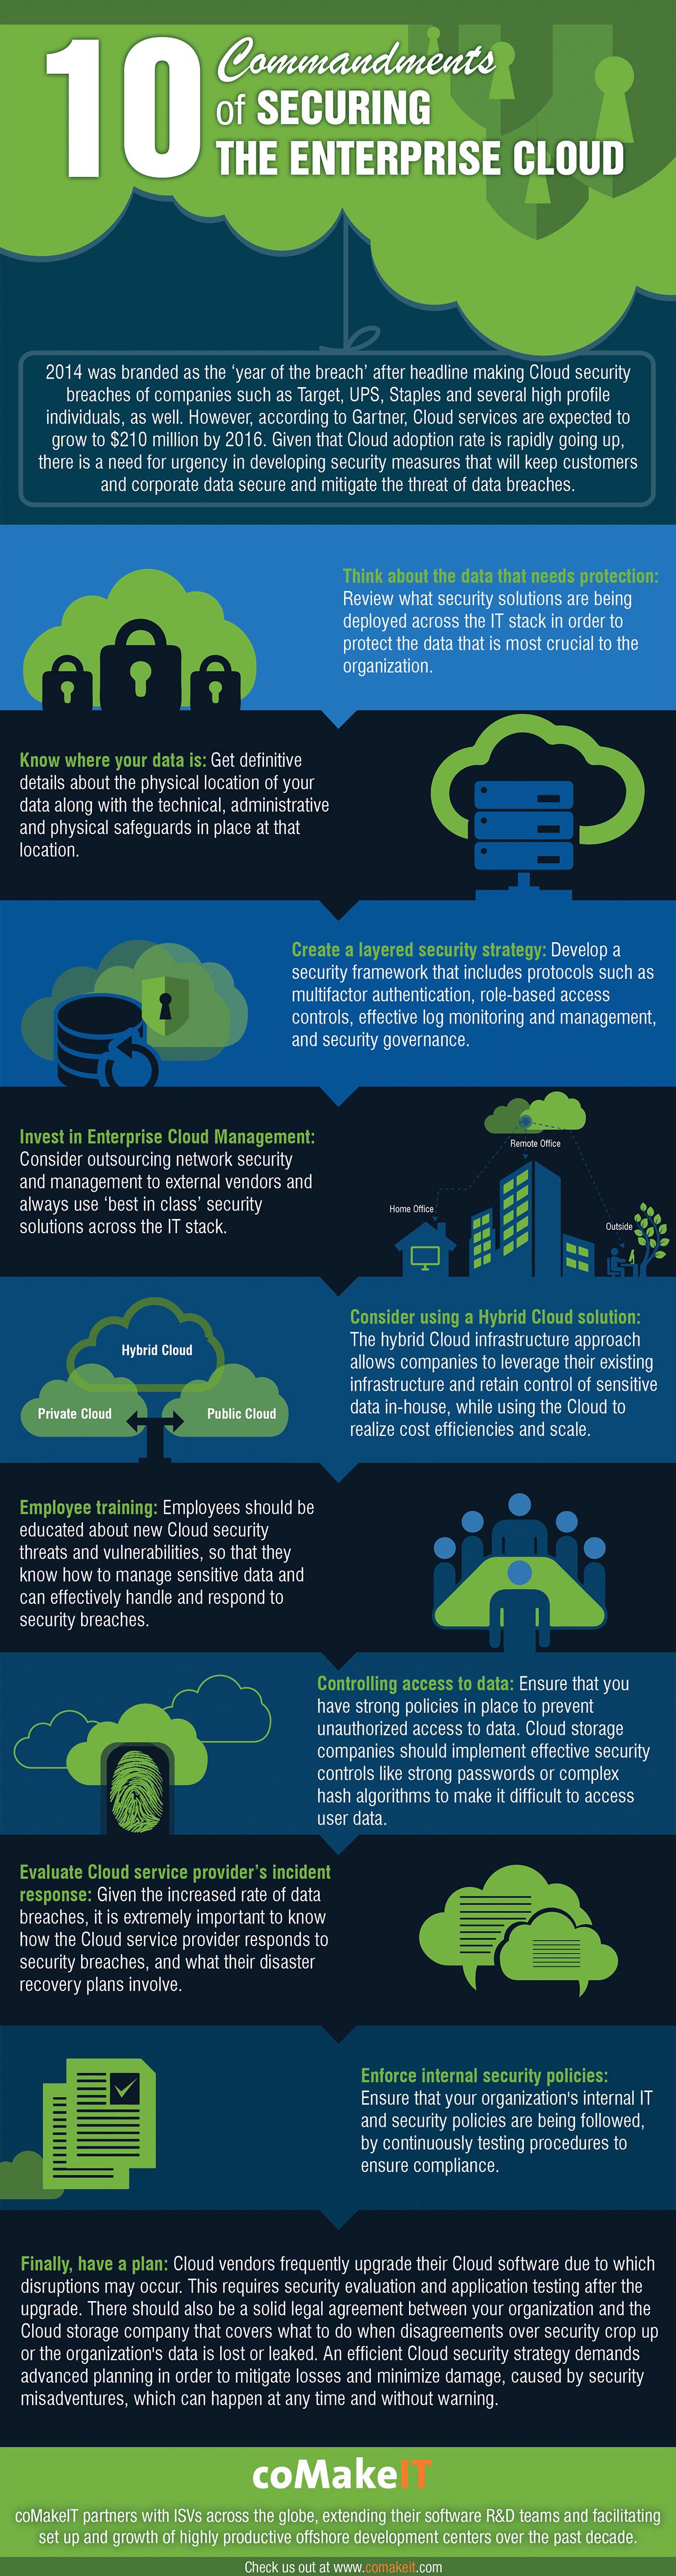 secure your enterprise cloud in ten crucial steps